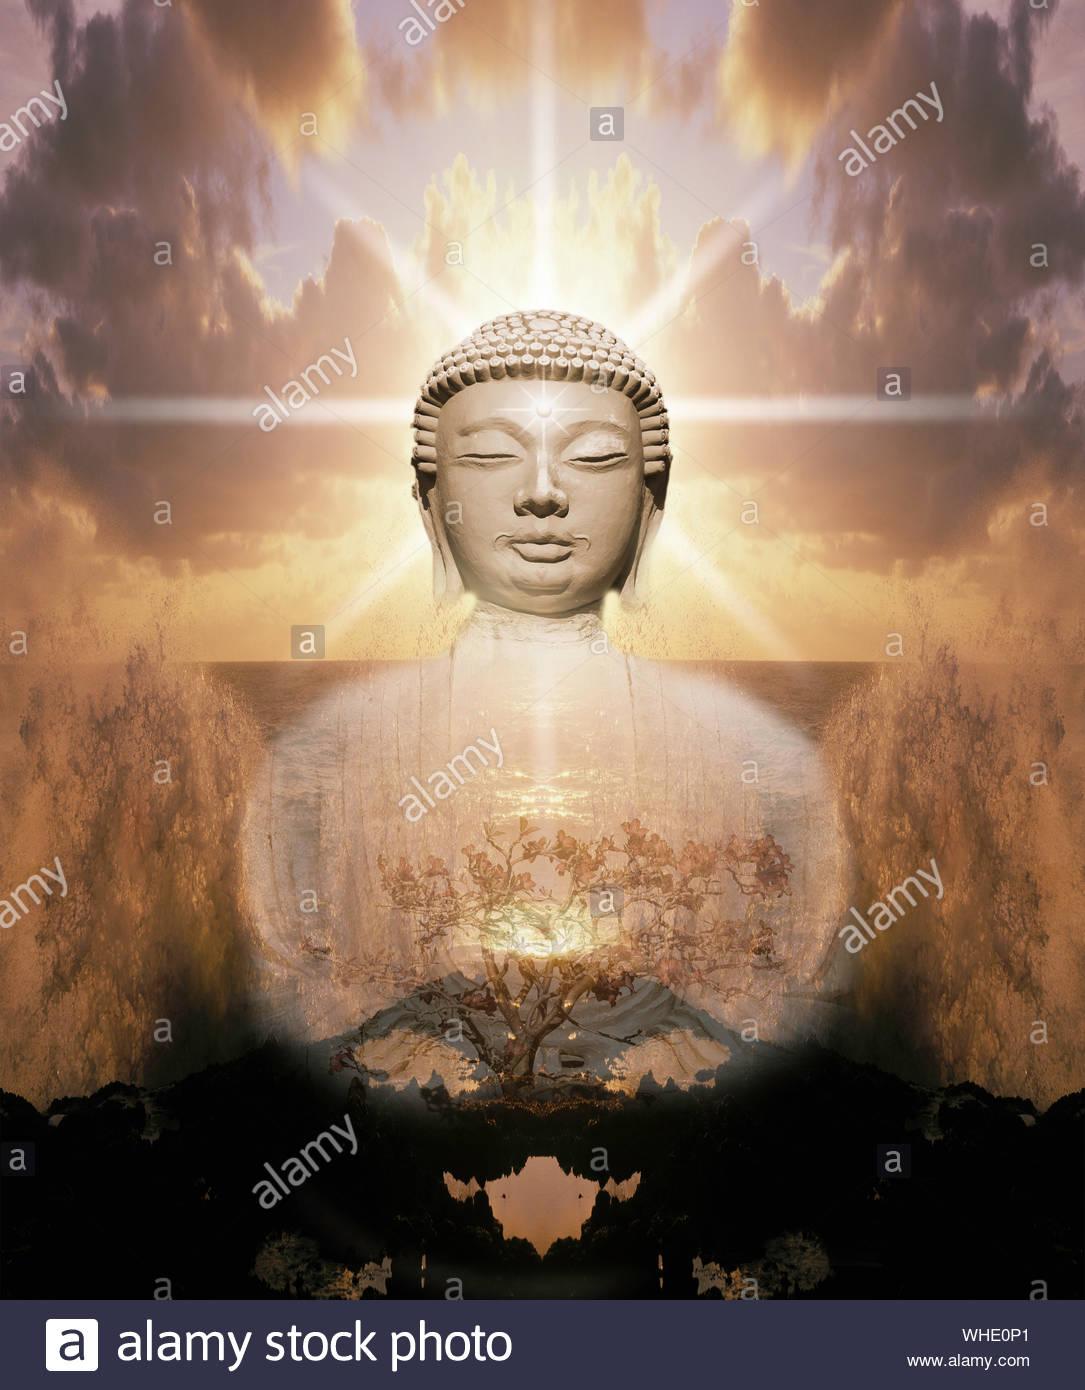 gautama-buddha-meditating-peace-nirvana-